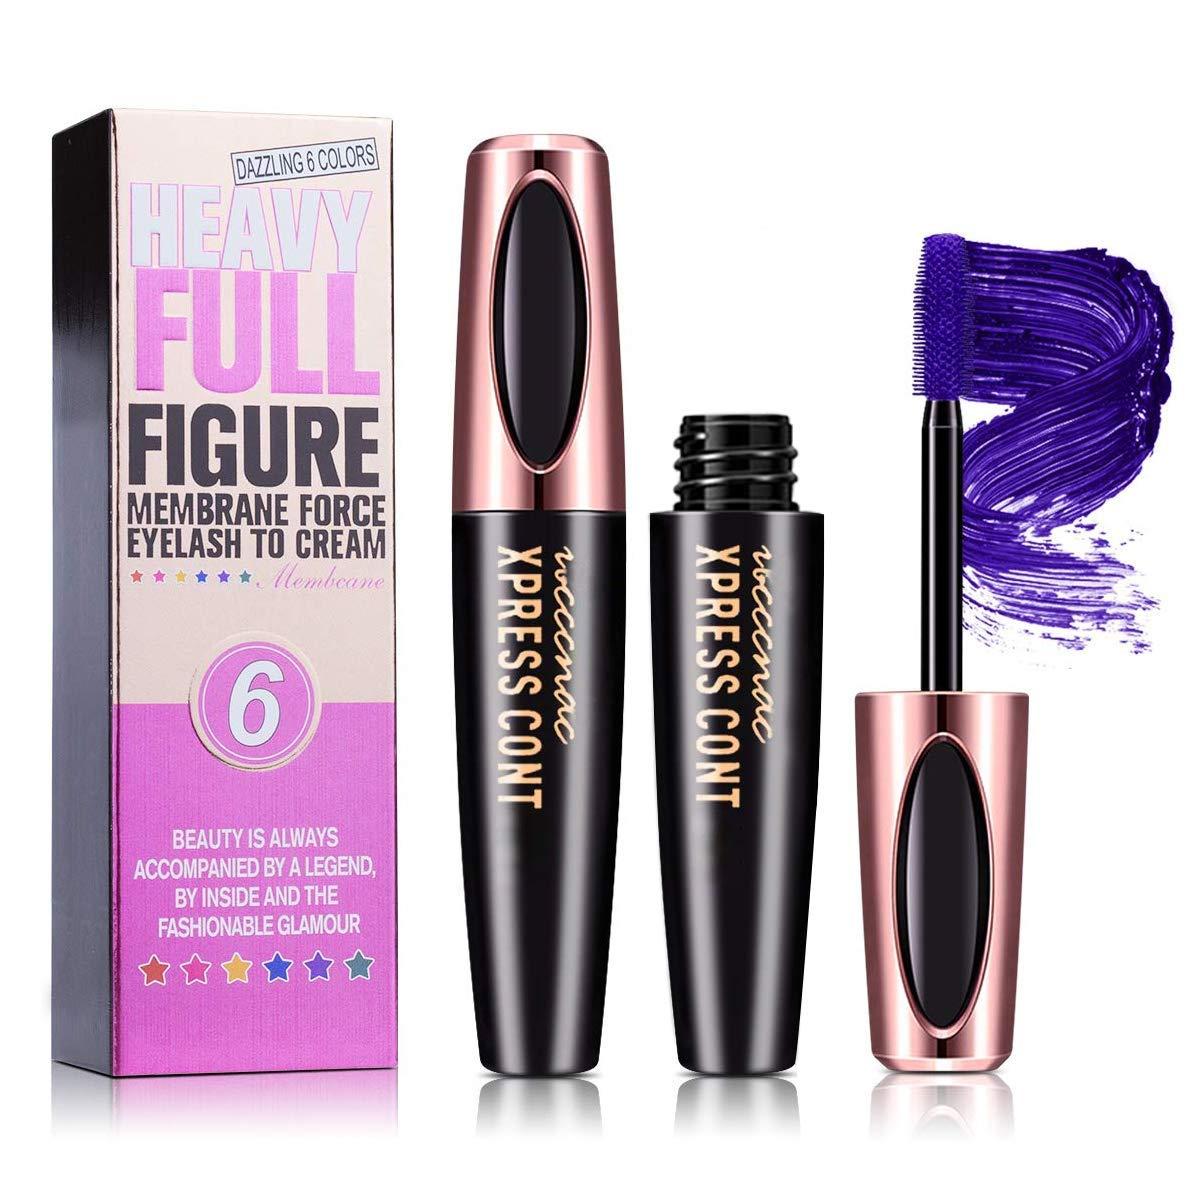 Waterproof Colored Mascara,4D Silk Fiber Lash Mascara,Luxuriously Longer,Thicker,Voluminous Eyelashes,Long-Lasting,Dramatic Extension,Smudge-proof,Hypoallergenic Formula (Purple)